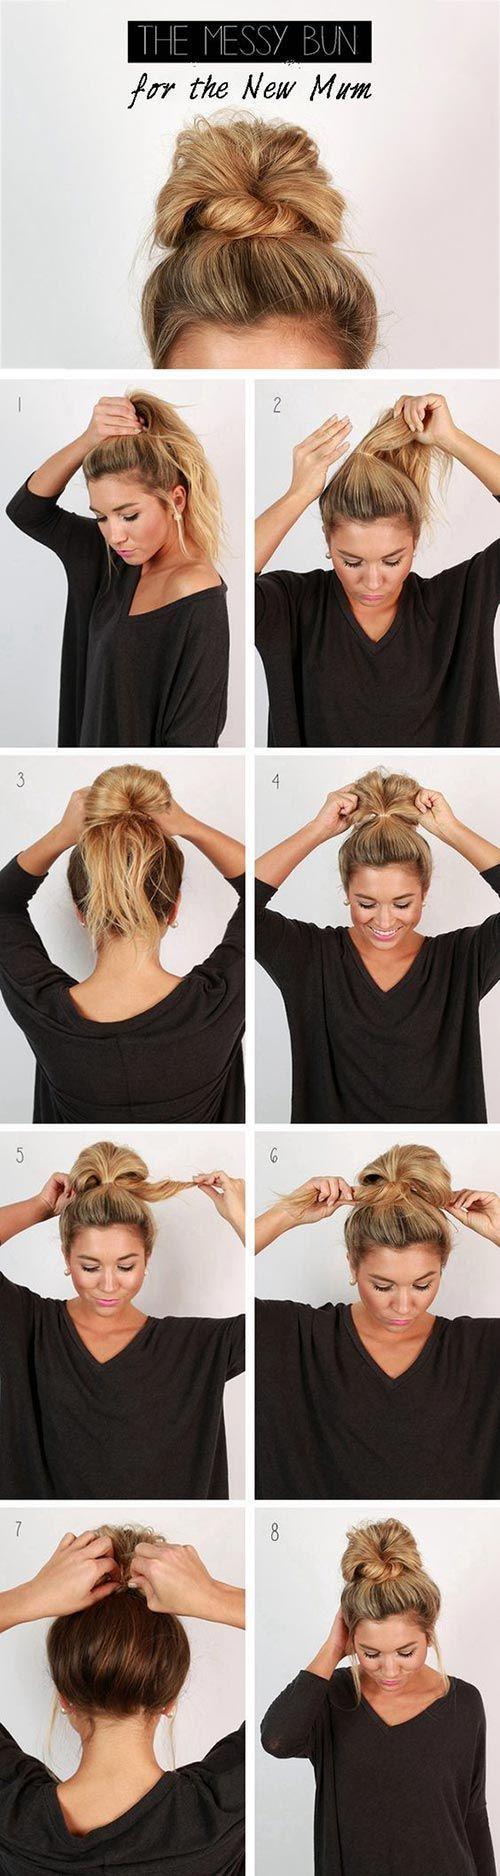 Coolest Messy Super High Bun Tutorial For Long Hair Hair Hairstyle Womentriangle Hair Styles Long Hair Styles Easy Updo Hairstyles